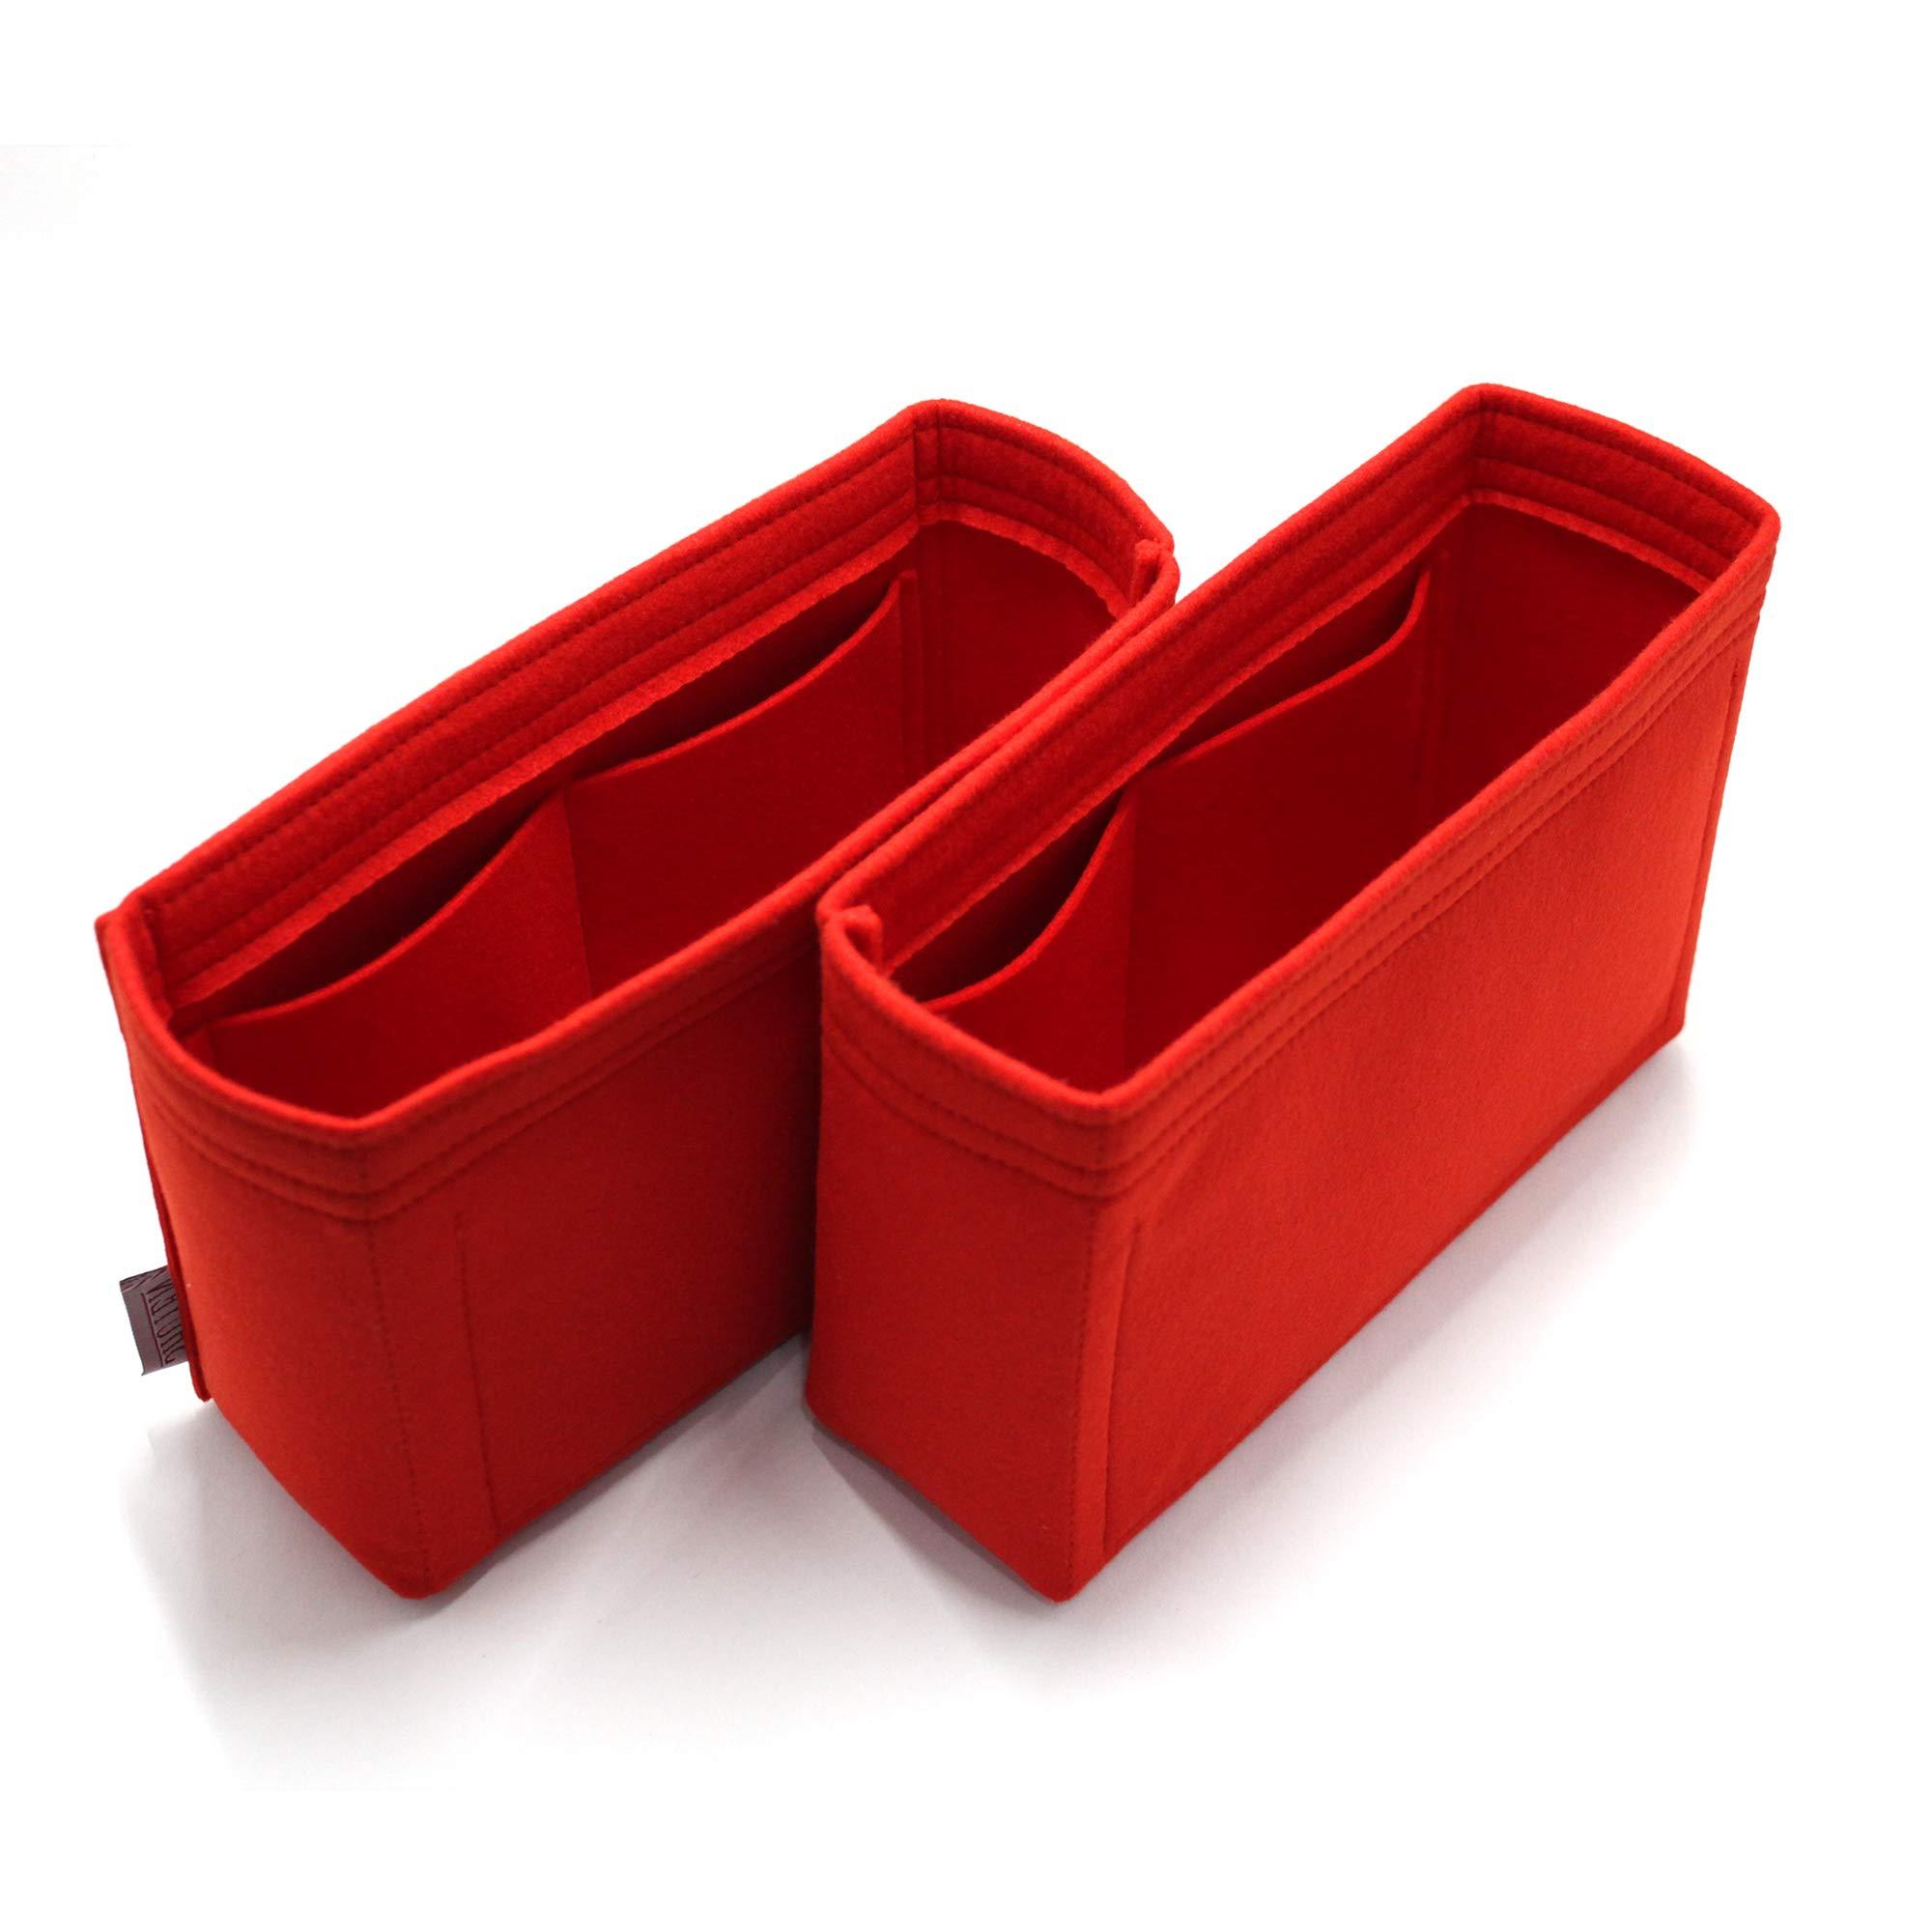 SHUYENTOKYO - for Louis Vuitton NEONOE size ORGANIZER 2mm FELT DIAPER BAG INSERT PURSE SHAPER ORGANIZE (TYPE.1) (1 Set of 2)